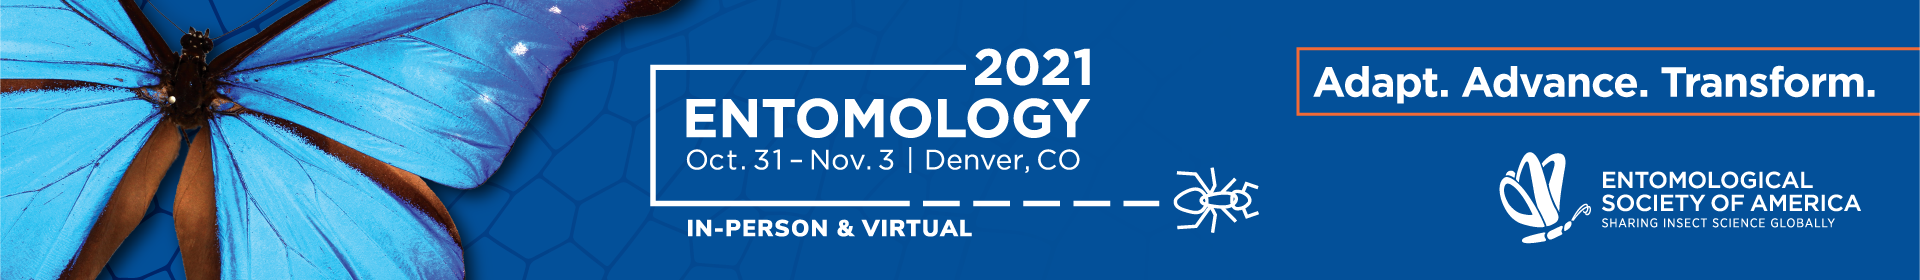 Entomology 2021 Event Banner